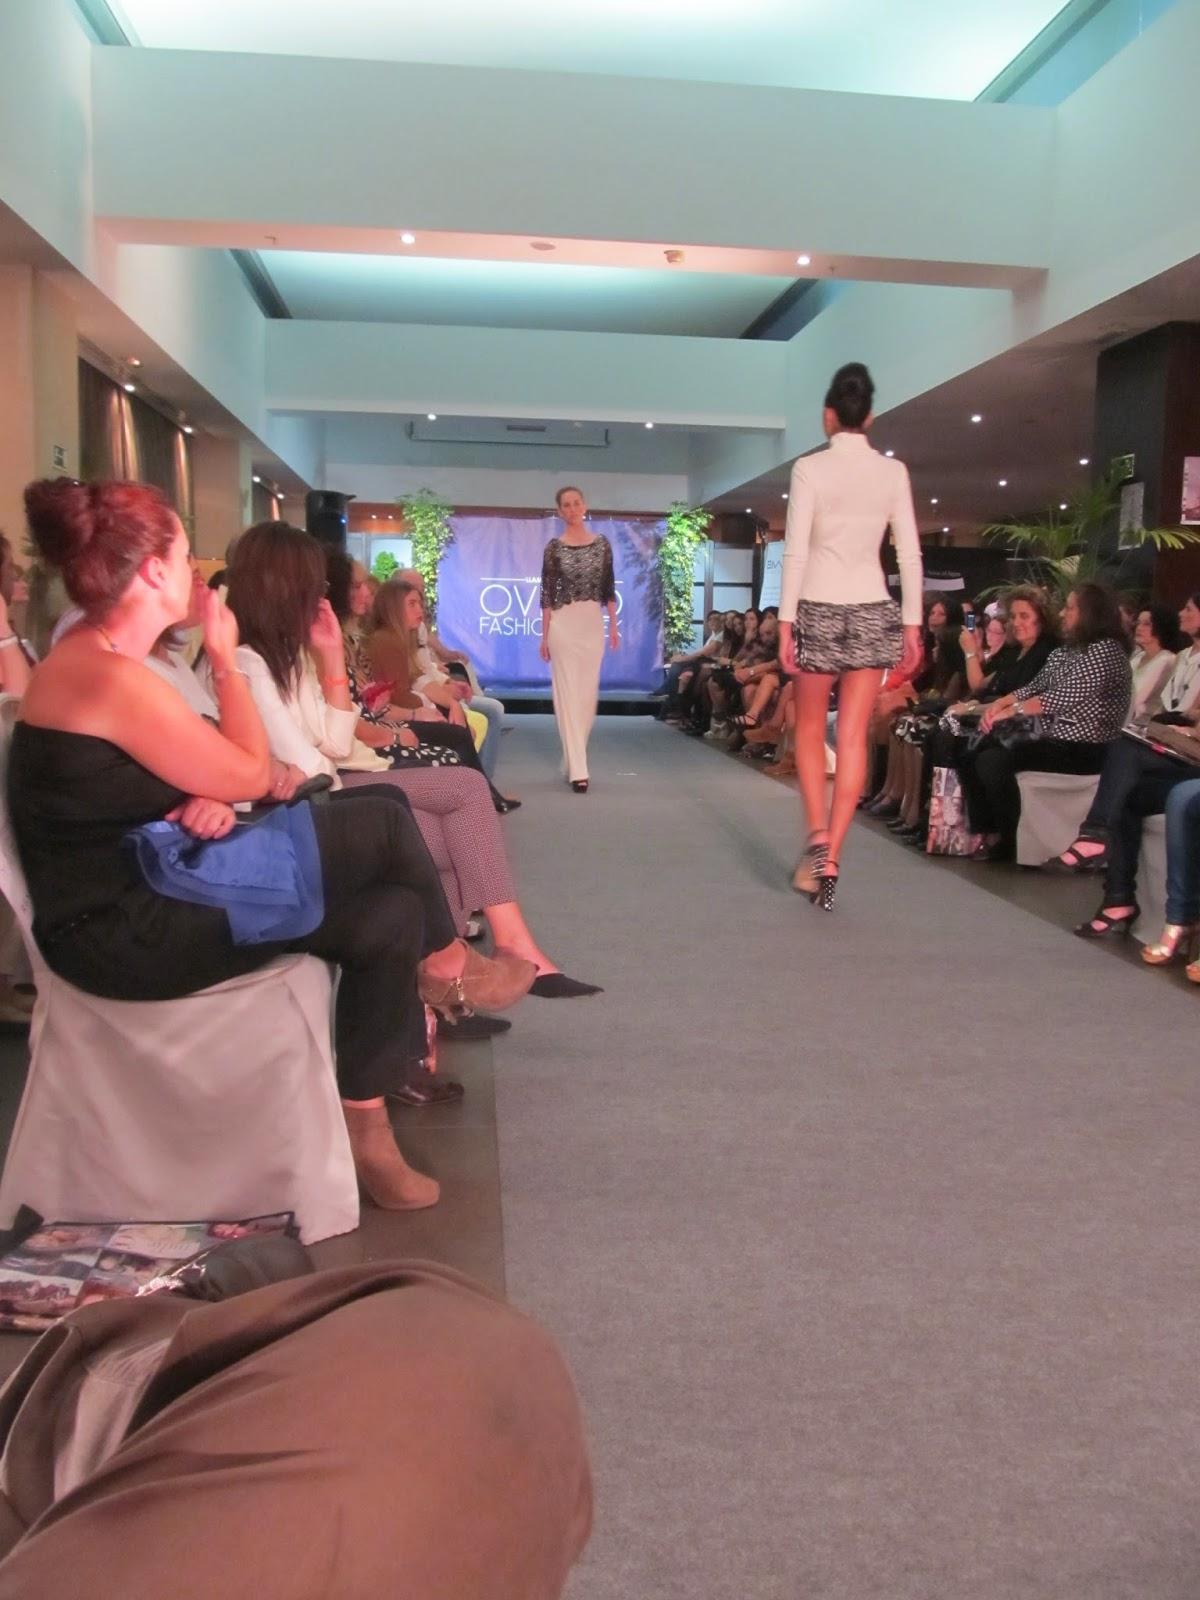 semana de la moda asturiana oviedo fashion week ofw fashion blog elenkolr moda